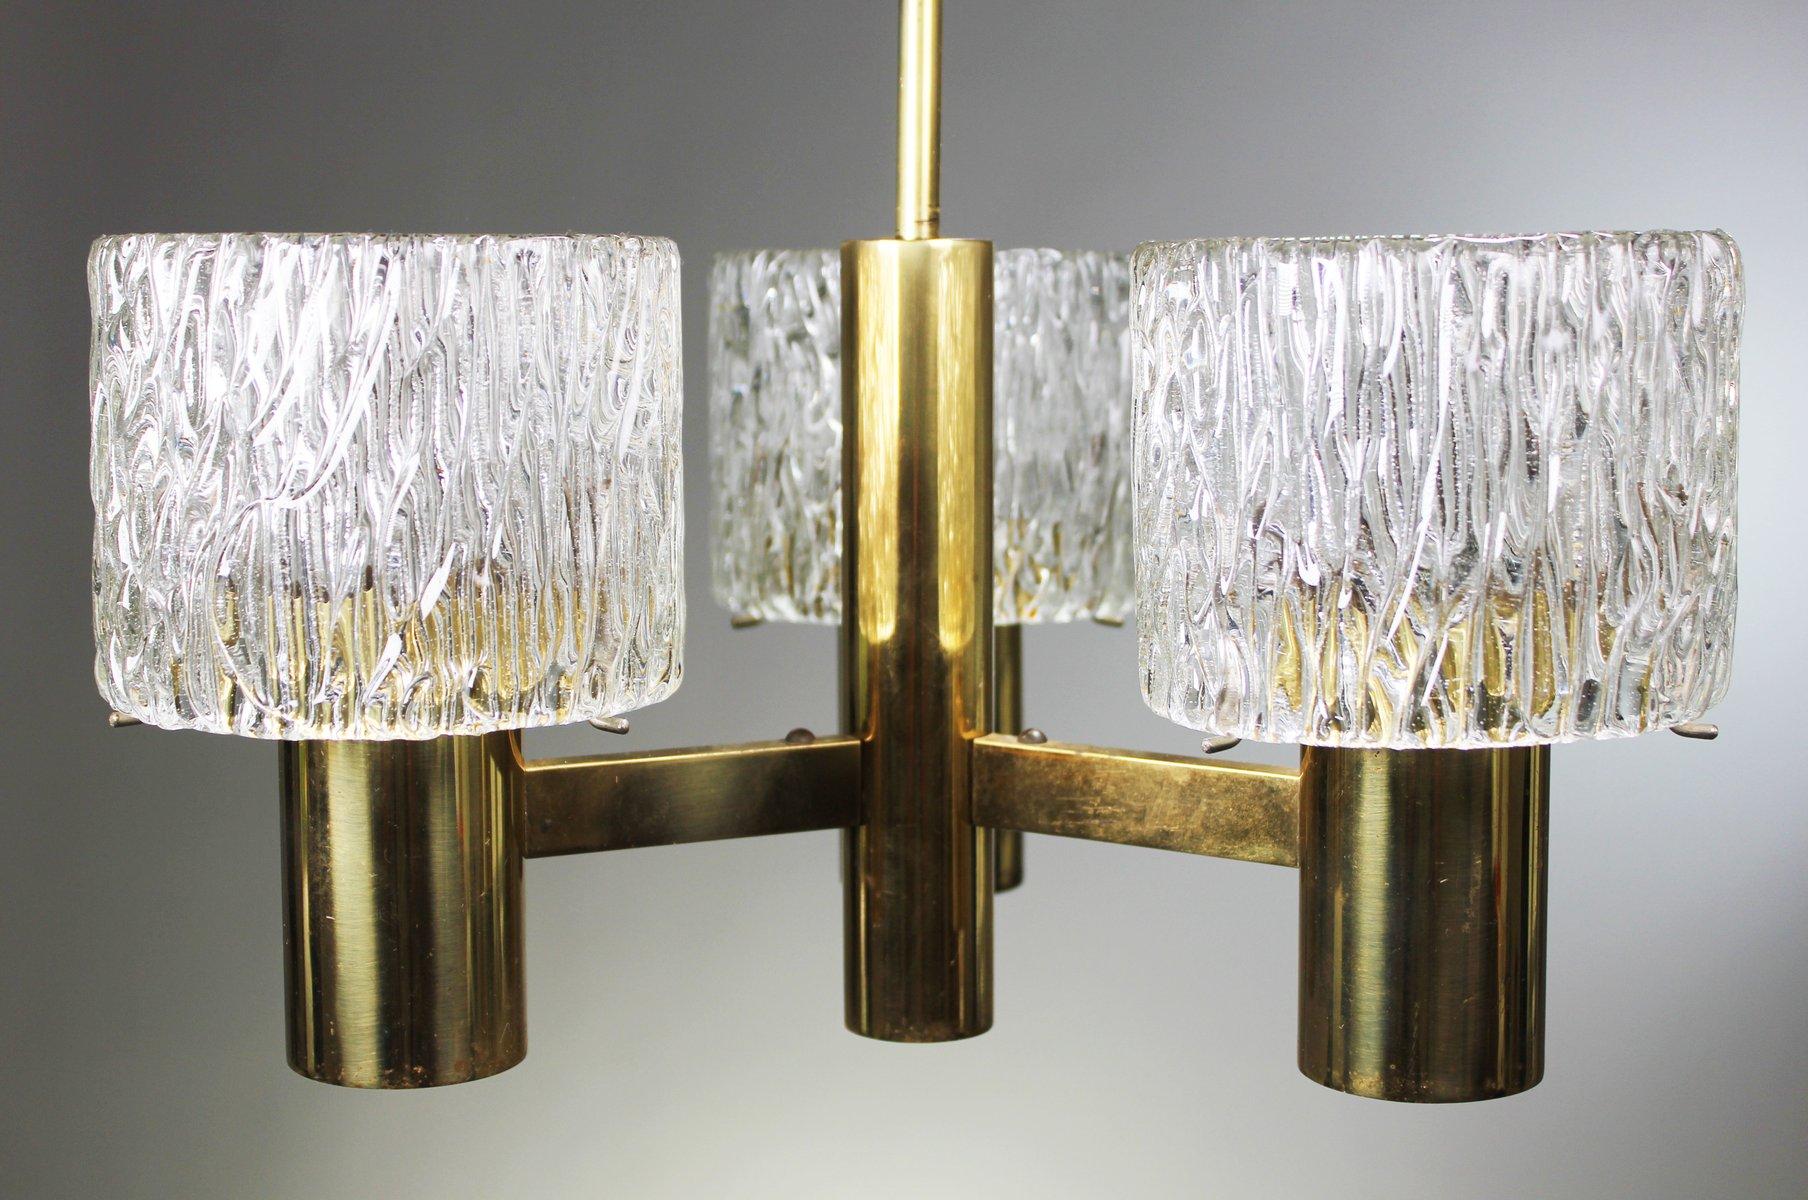 Moderne Große Kronleuchter ~ Kristall kronleuchter antik von befriedigend kristall